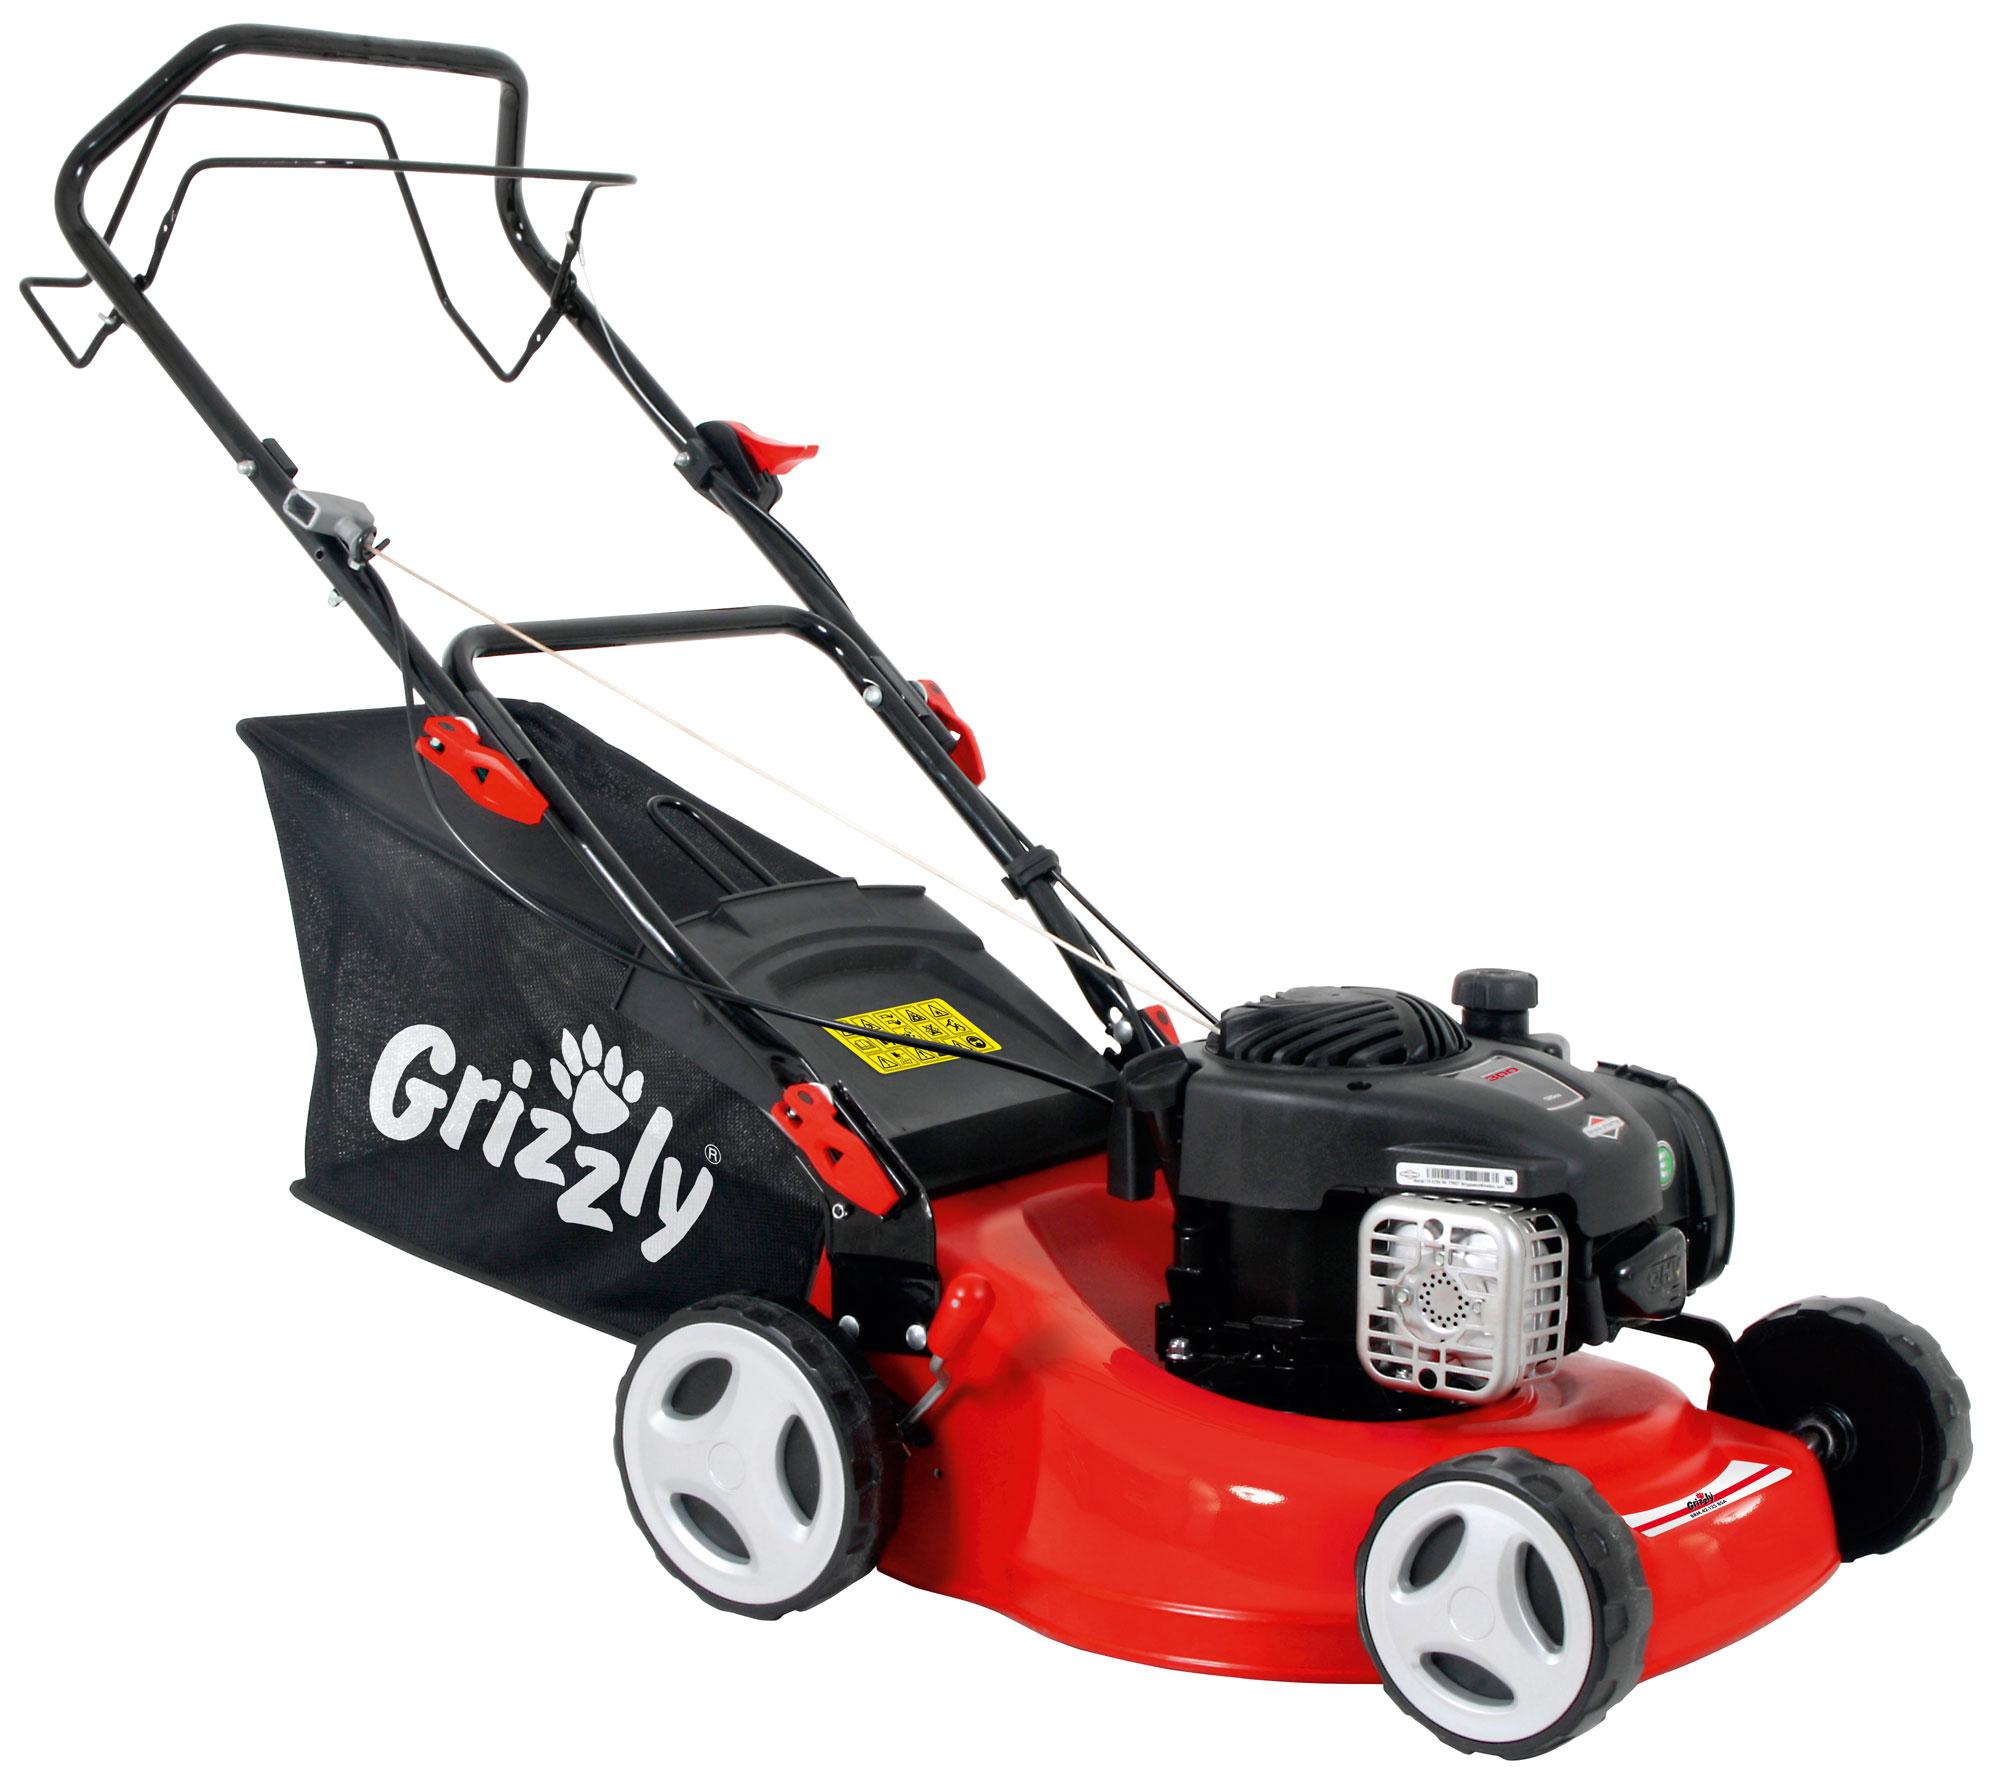 benzin rasenm her grizzly brm 42 125 bsa mit b s motor 1 82kw sb 42cm bei. Black Bedroom Furniture Sets. Home Design Ideas